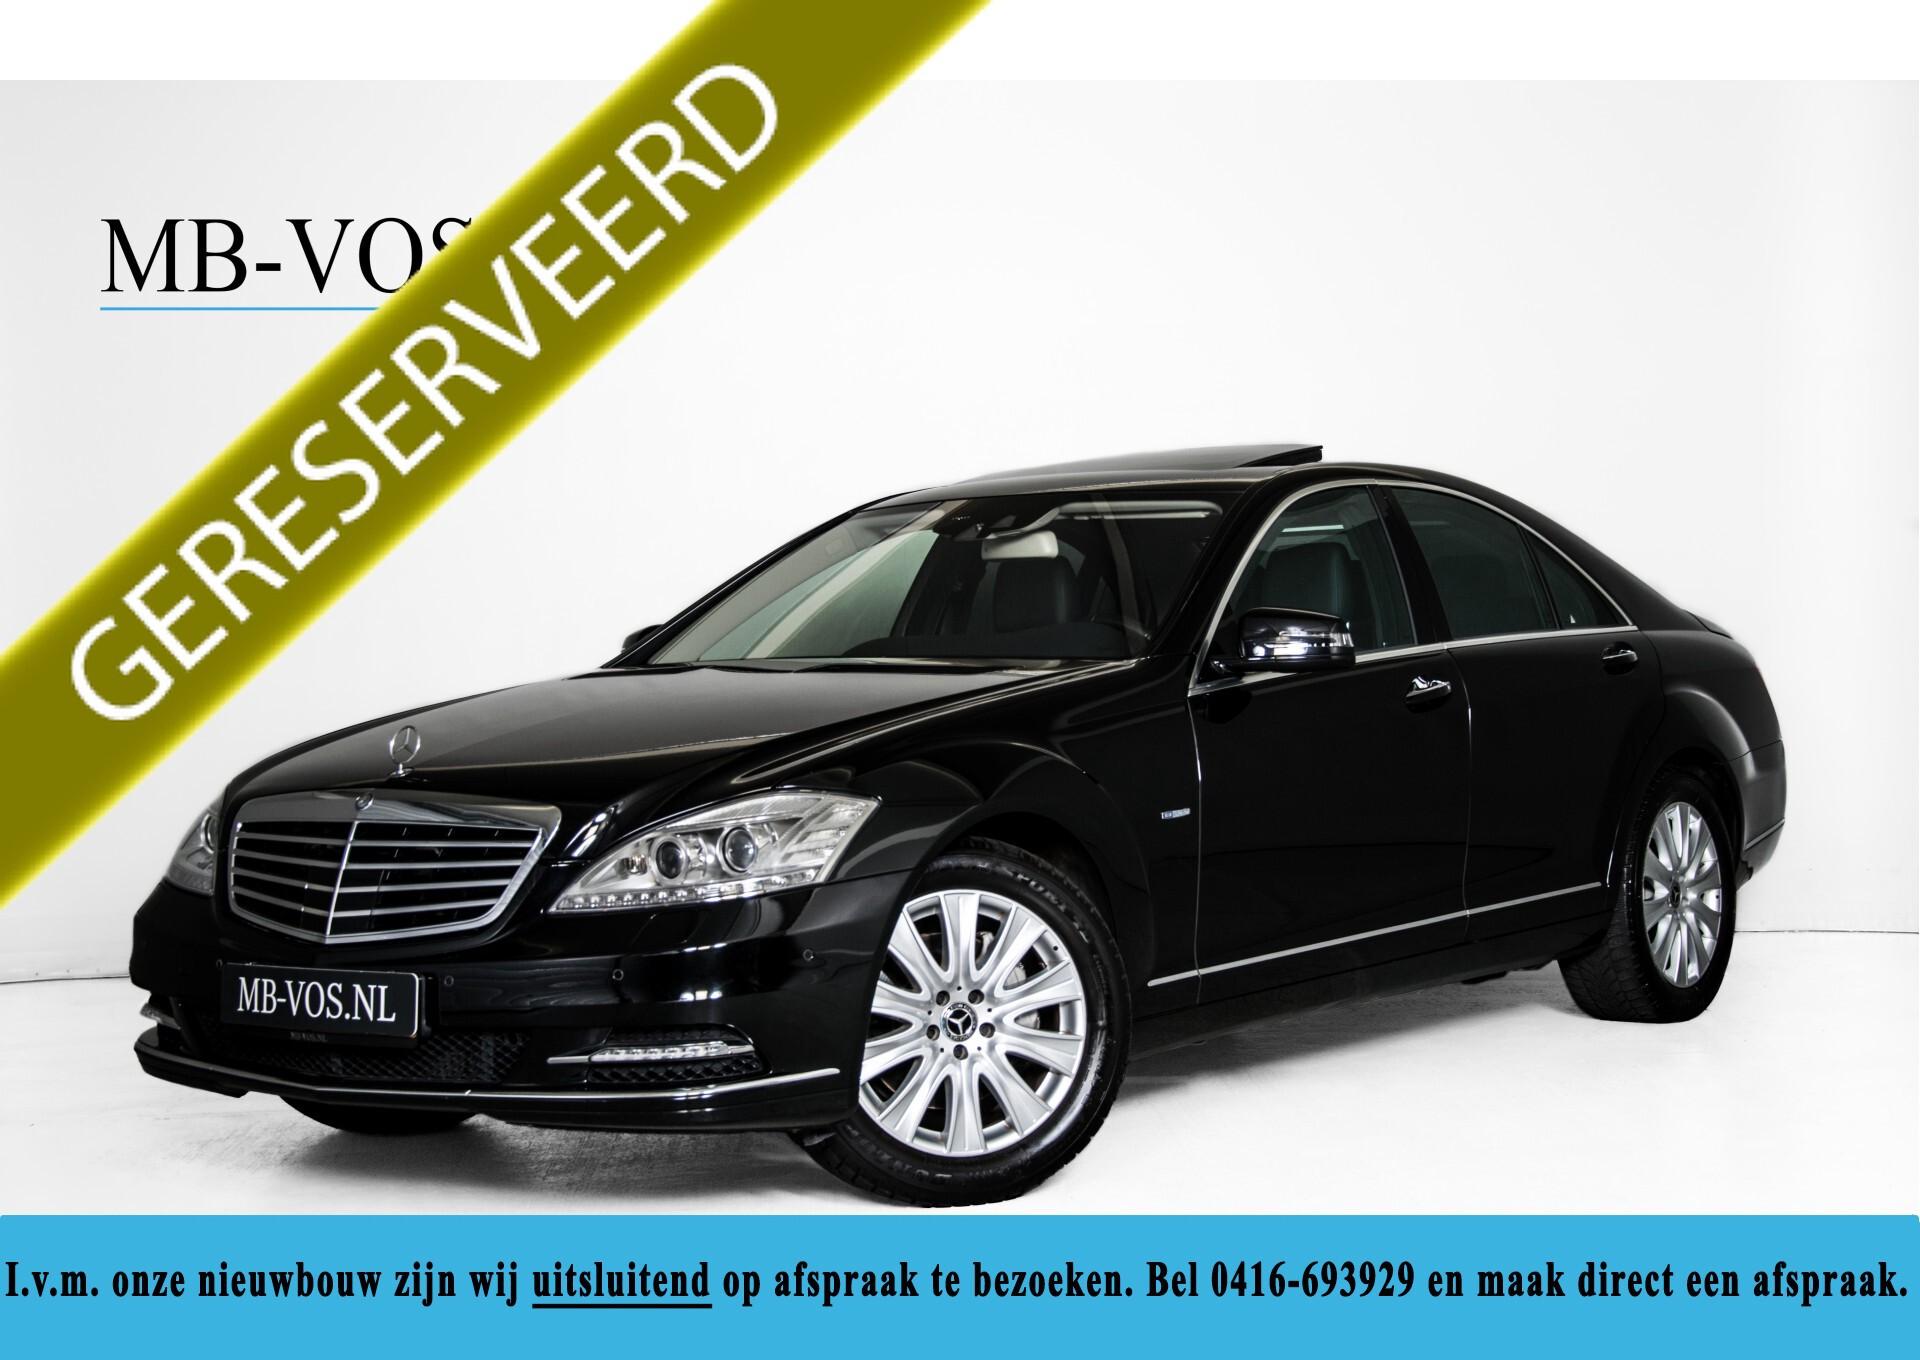 Mercedes-Benz S-Klasse 350 Bluetec Keyless/Distronic/Nightvision/Schuifdak/Harman-Kardon Aut7 Foto 1